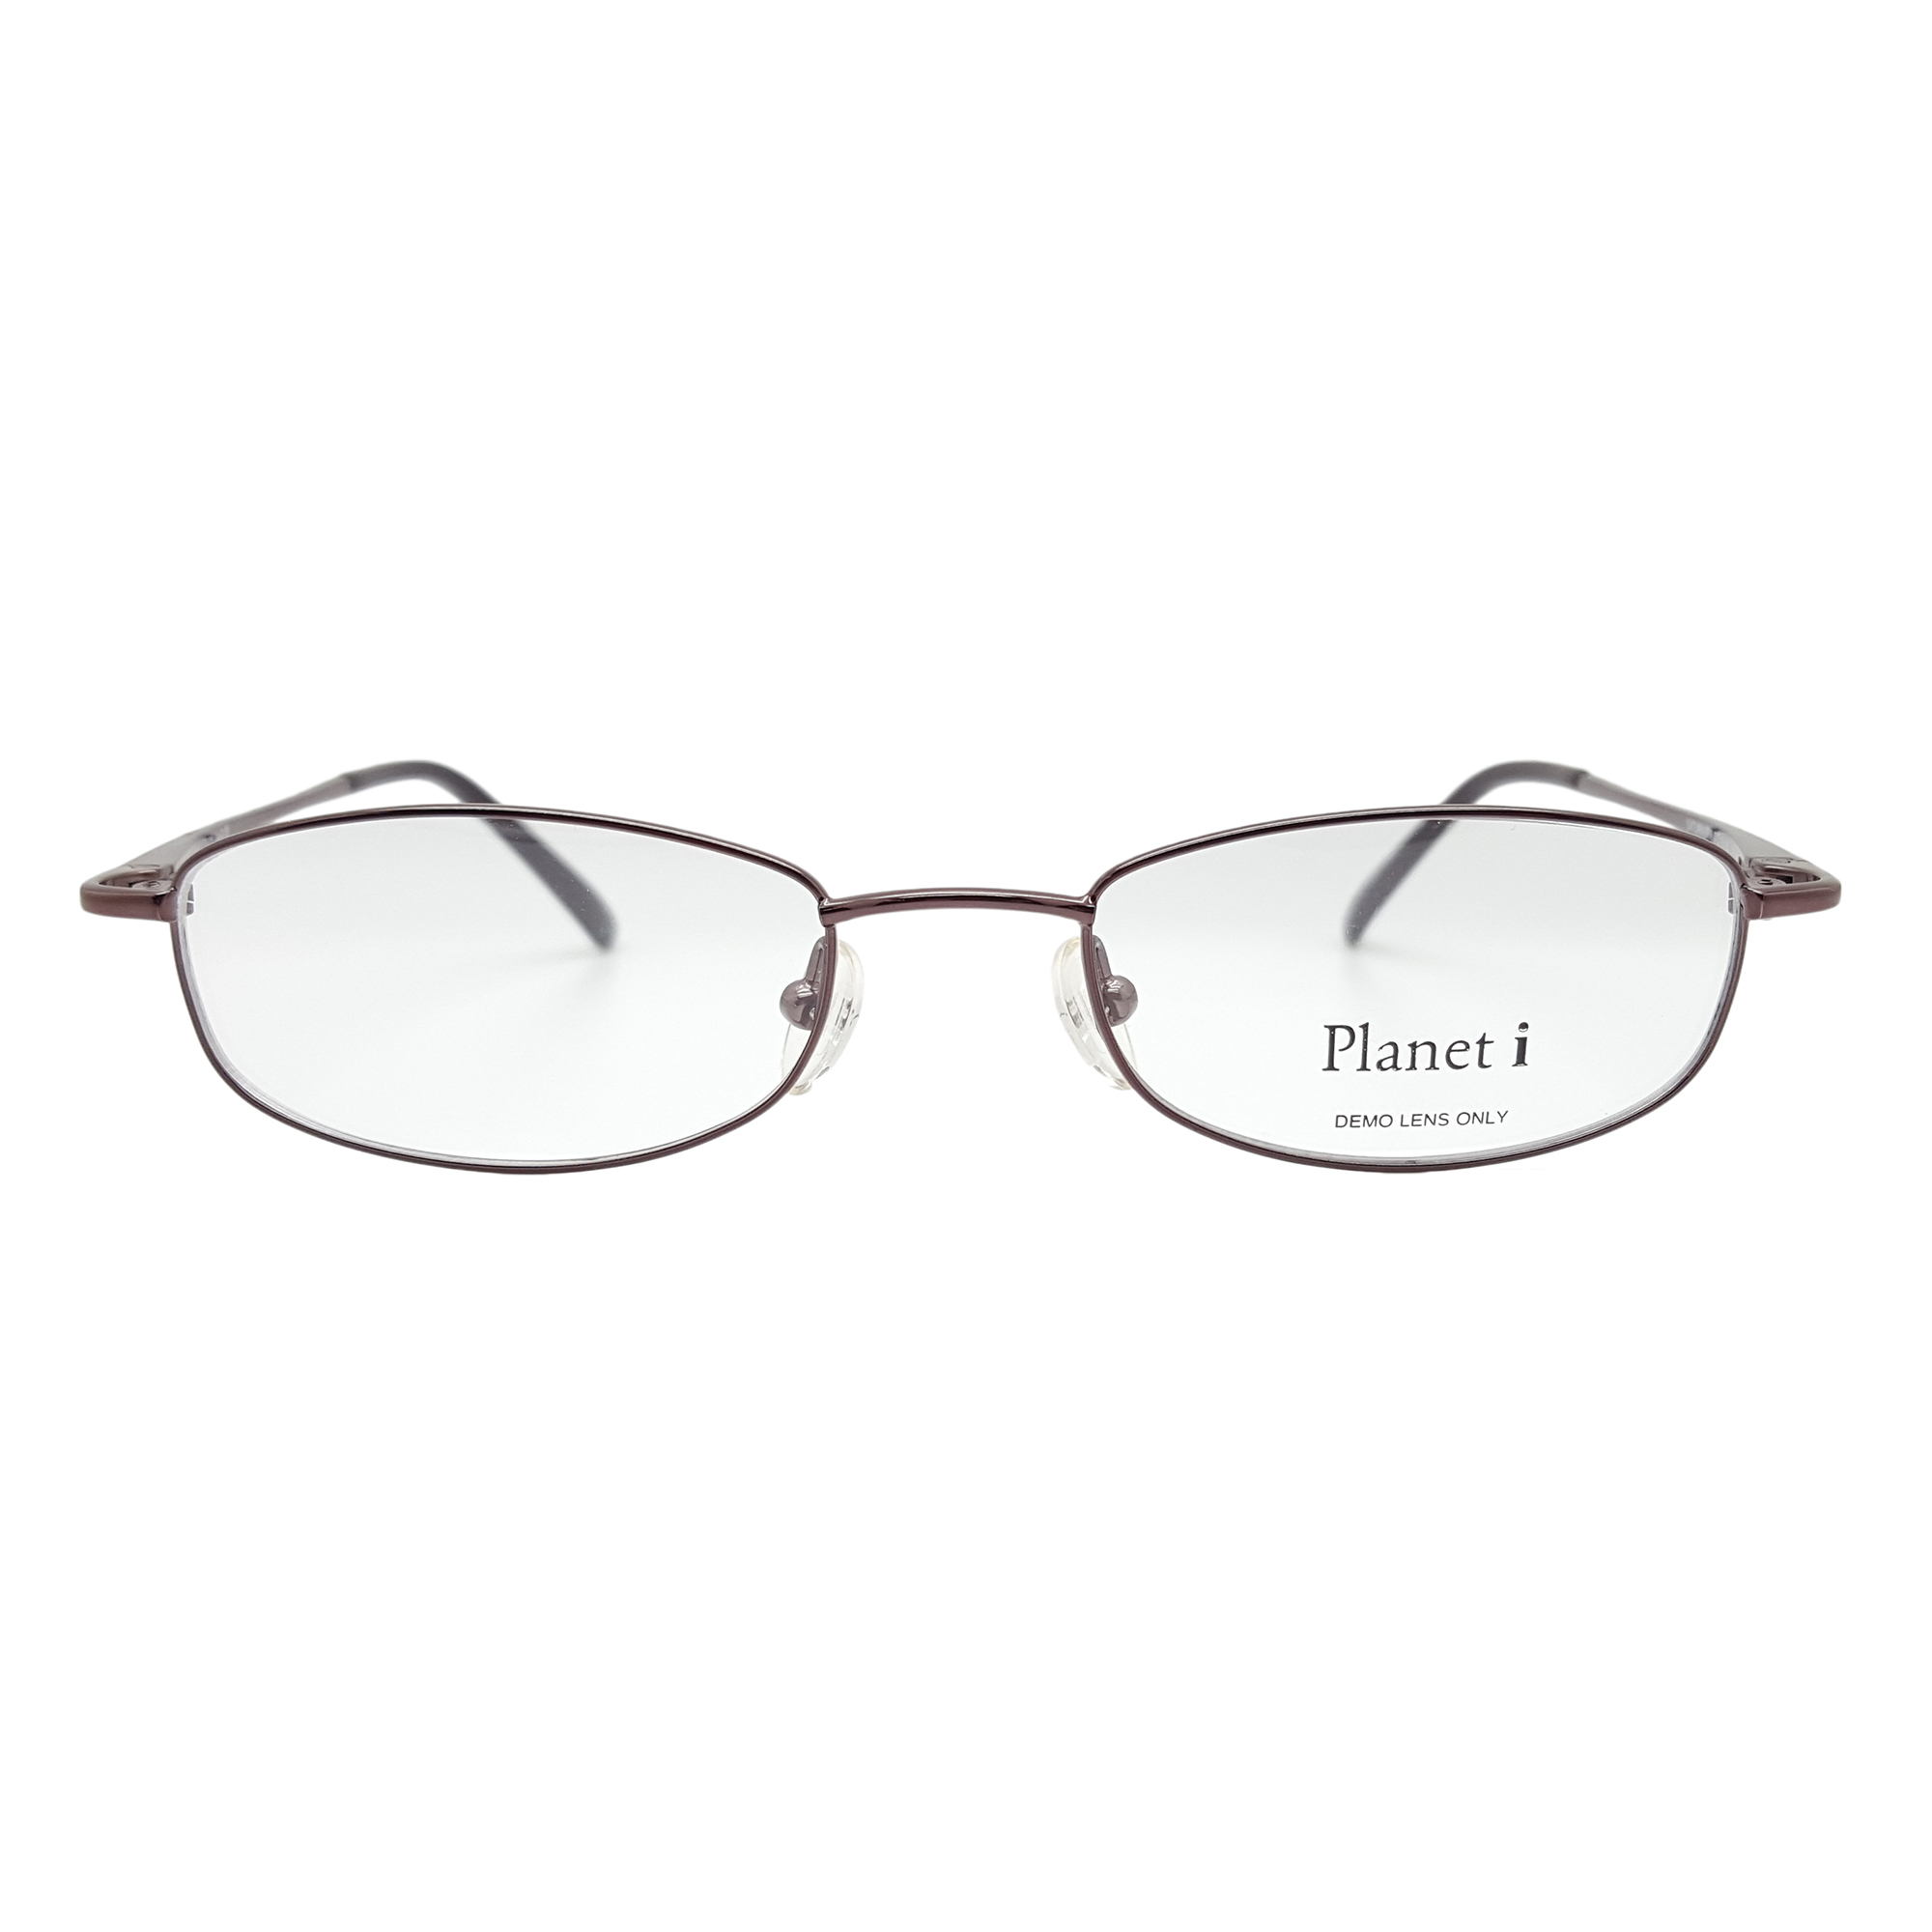 Planet i Saturn Eyeglasses Prescription Frames, 47-18-135 | eBay